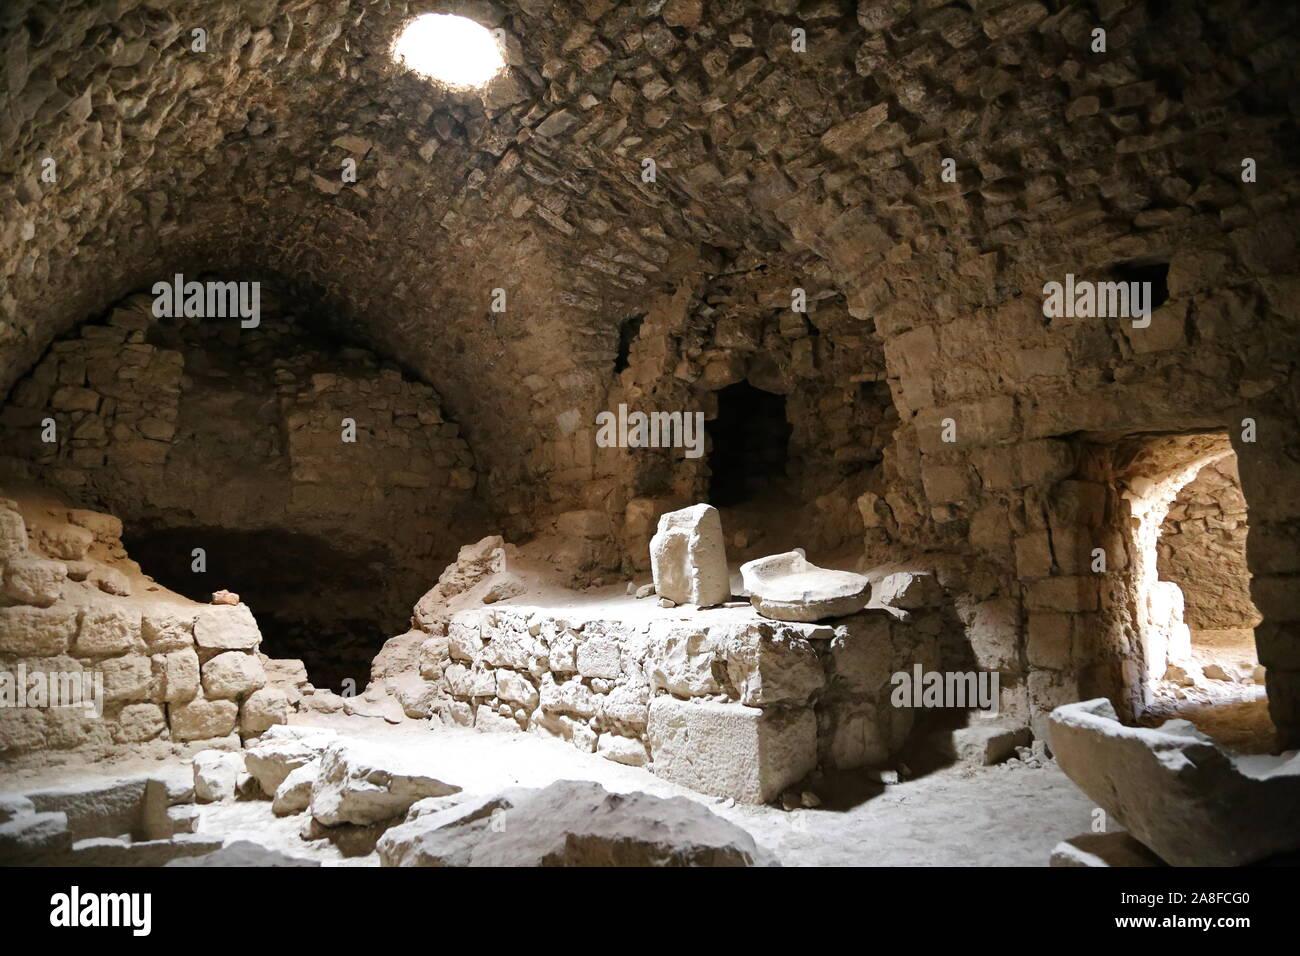 Oven, Karak Castle, Al Karak, Karak Governorate, Jordan, Middle East Stock Photo